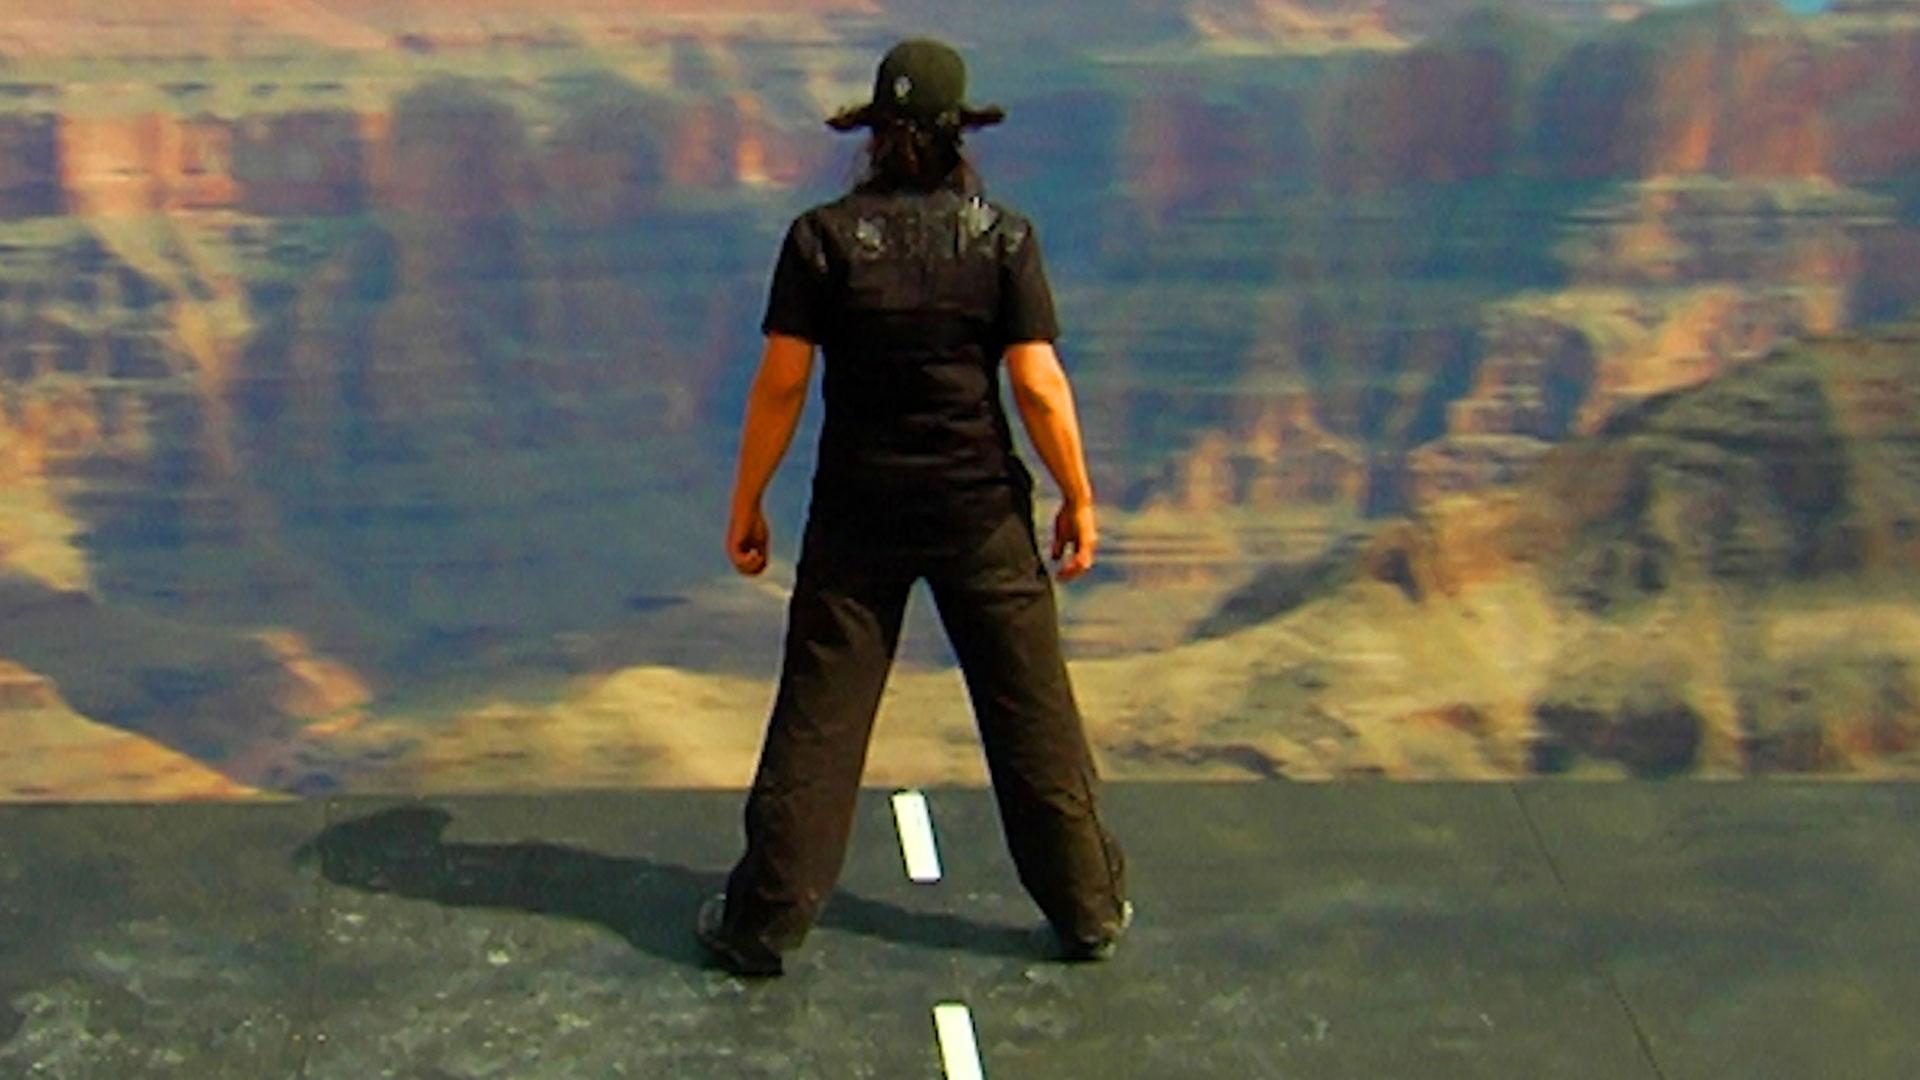 The Grand Canyon Death Jump